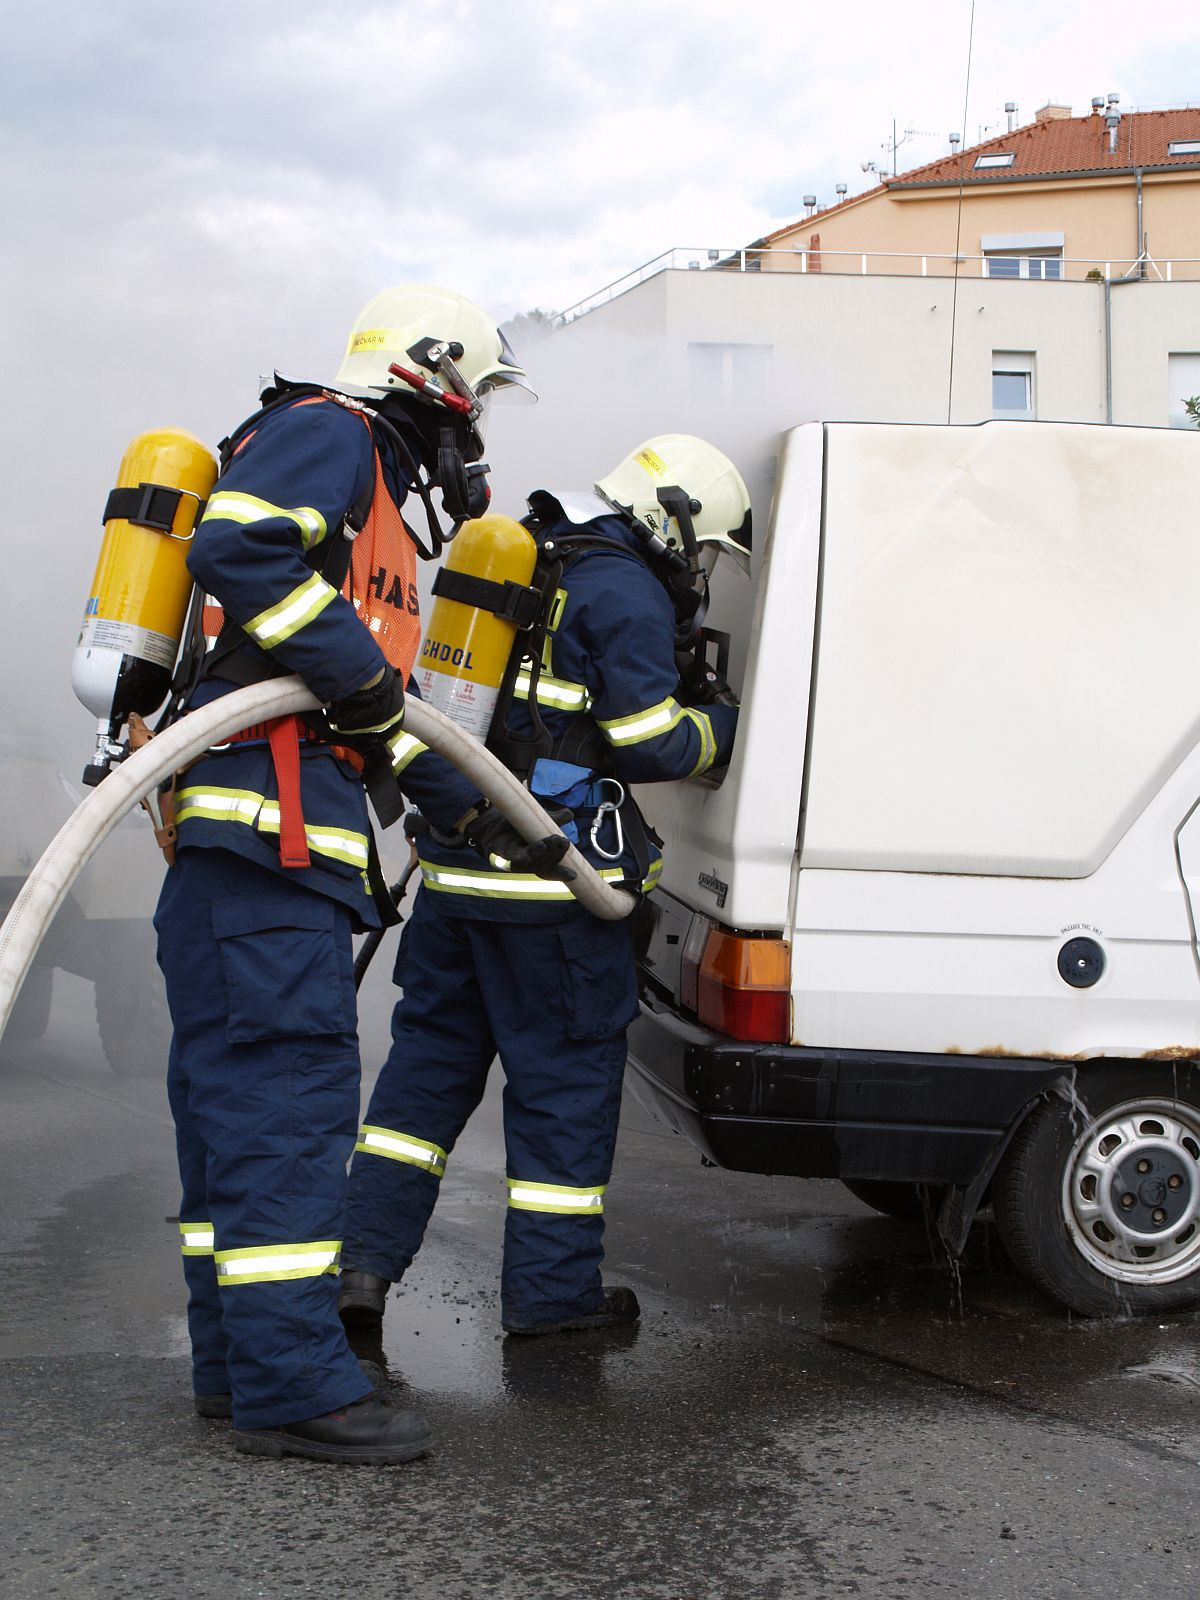 Hasiči likvidují požář auta